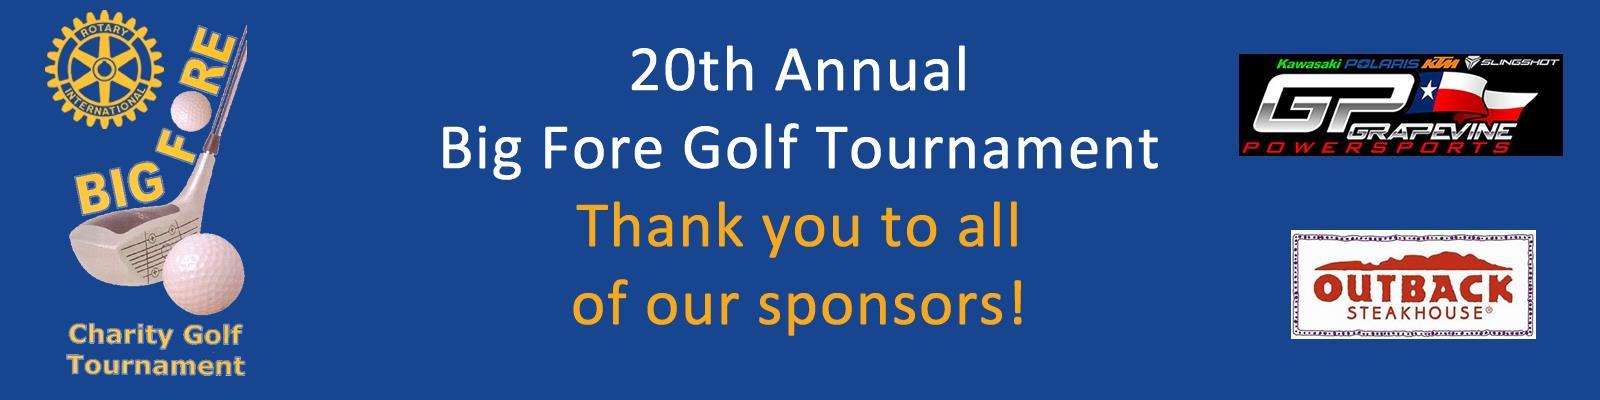 2018 Big Fore Golf Tournament